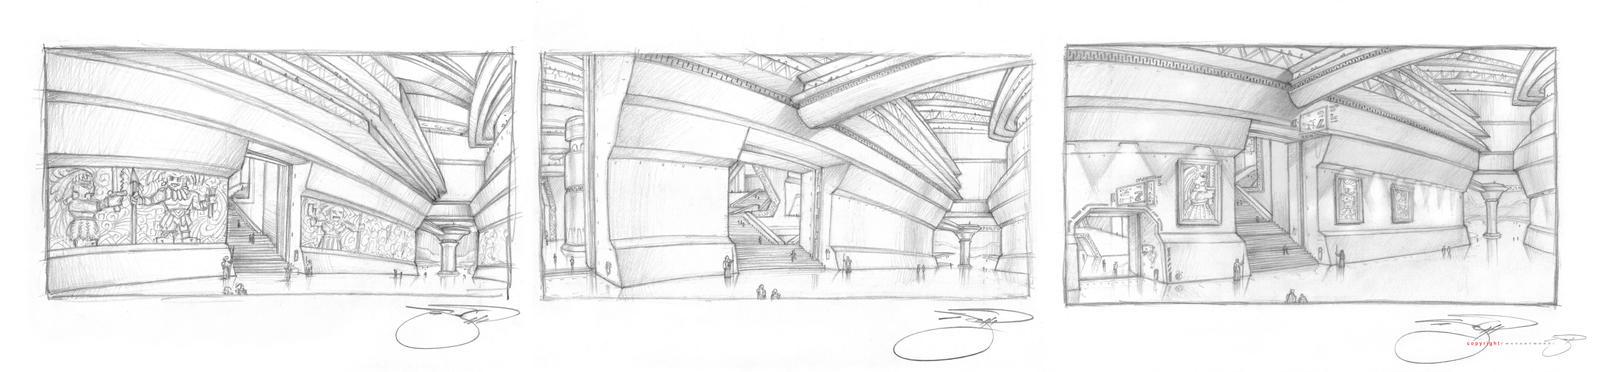 Gargan Grand Corridor Sketches by mavartworx